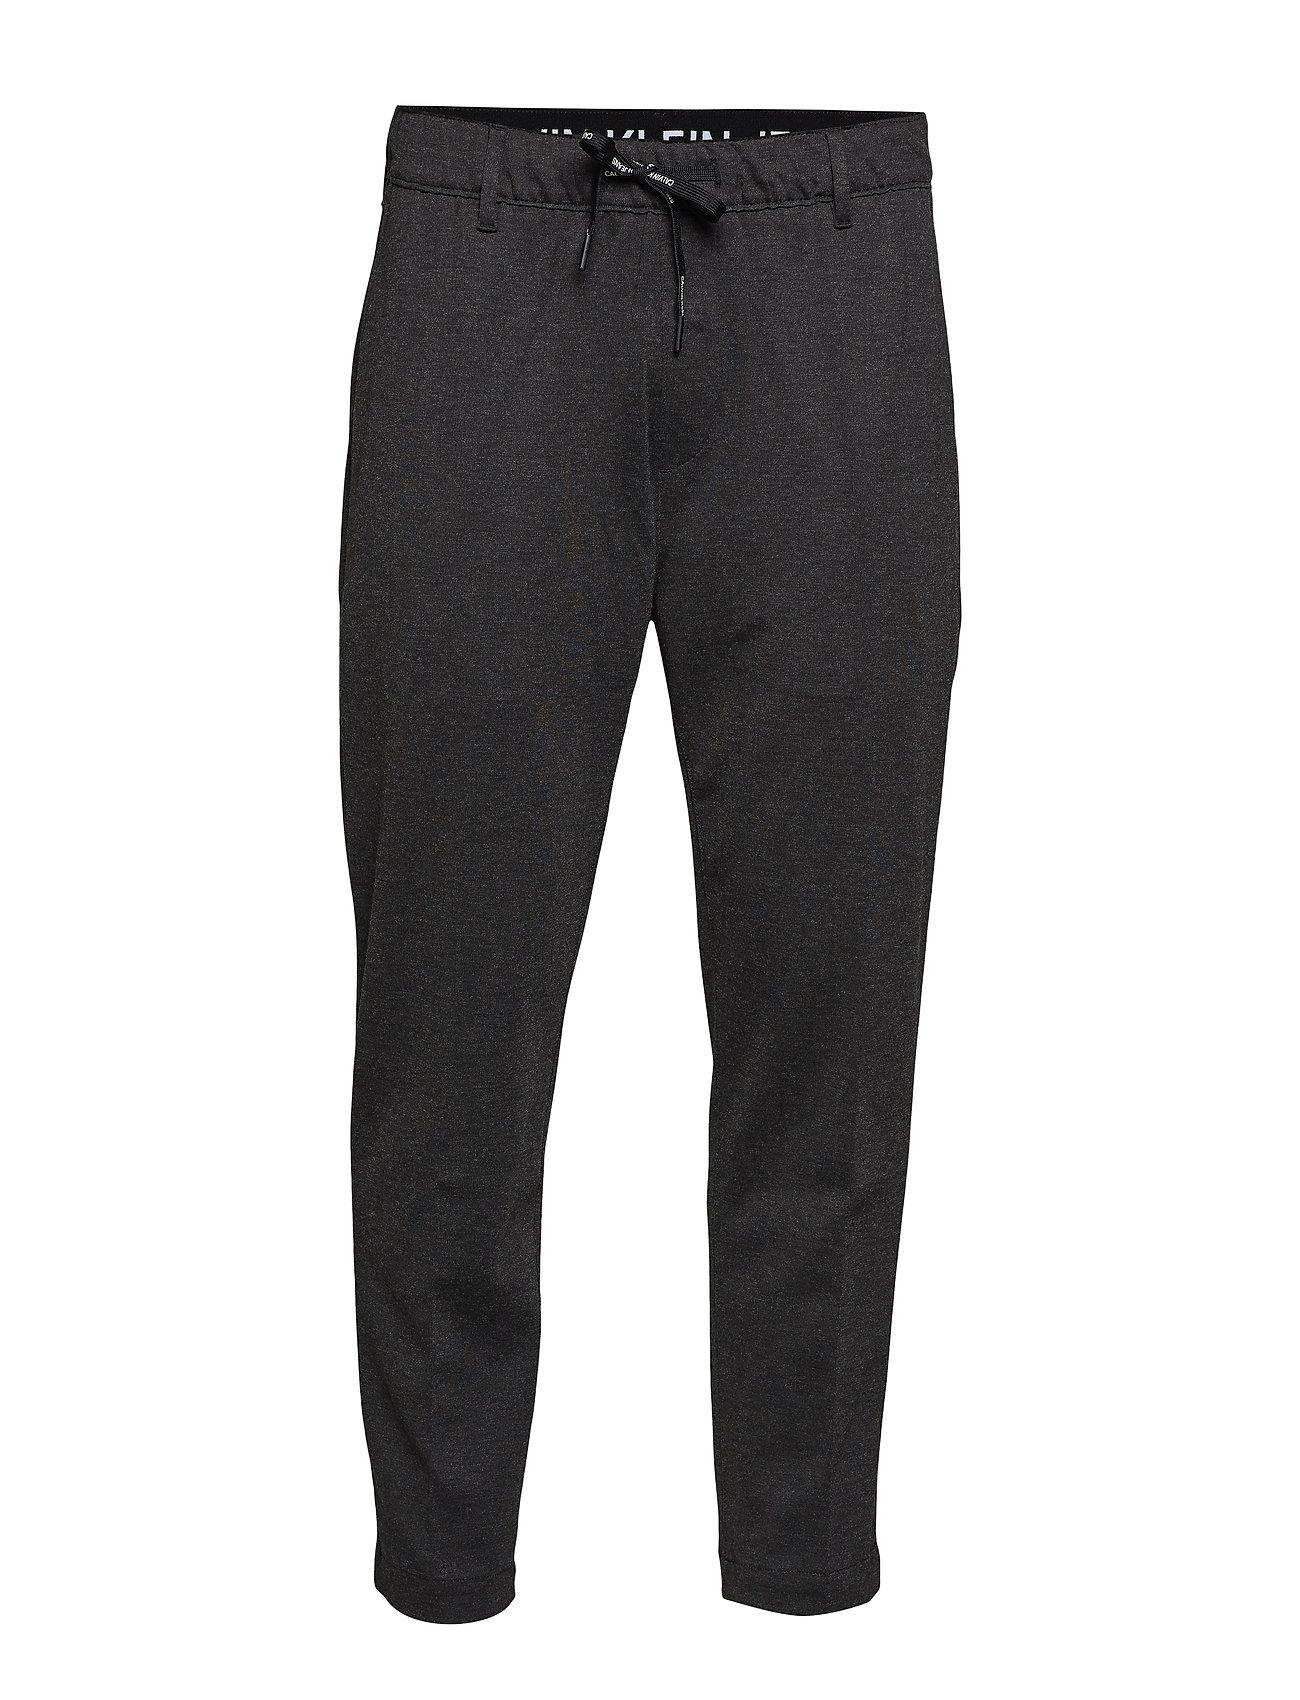 Calvin Klein Jeans GALFOS MELANGE PANTS - CHARCOAL